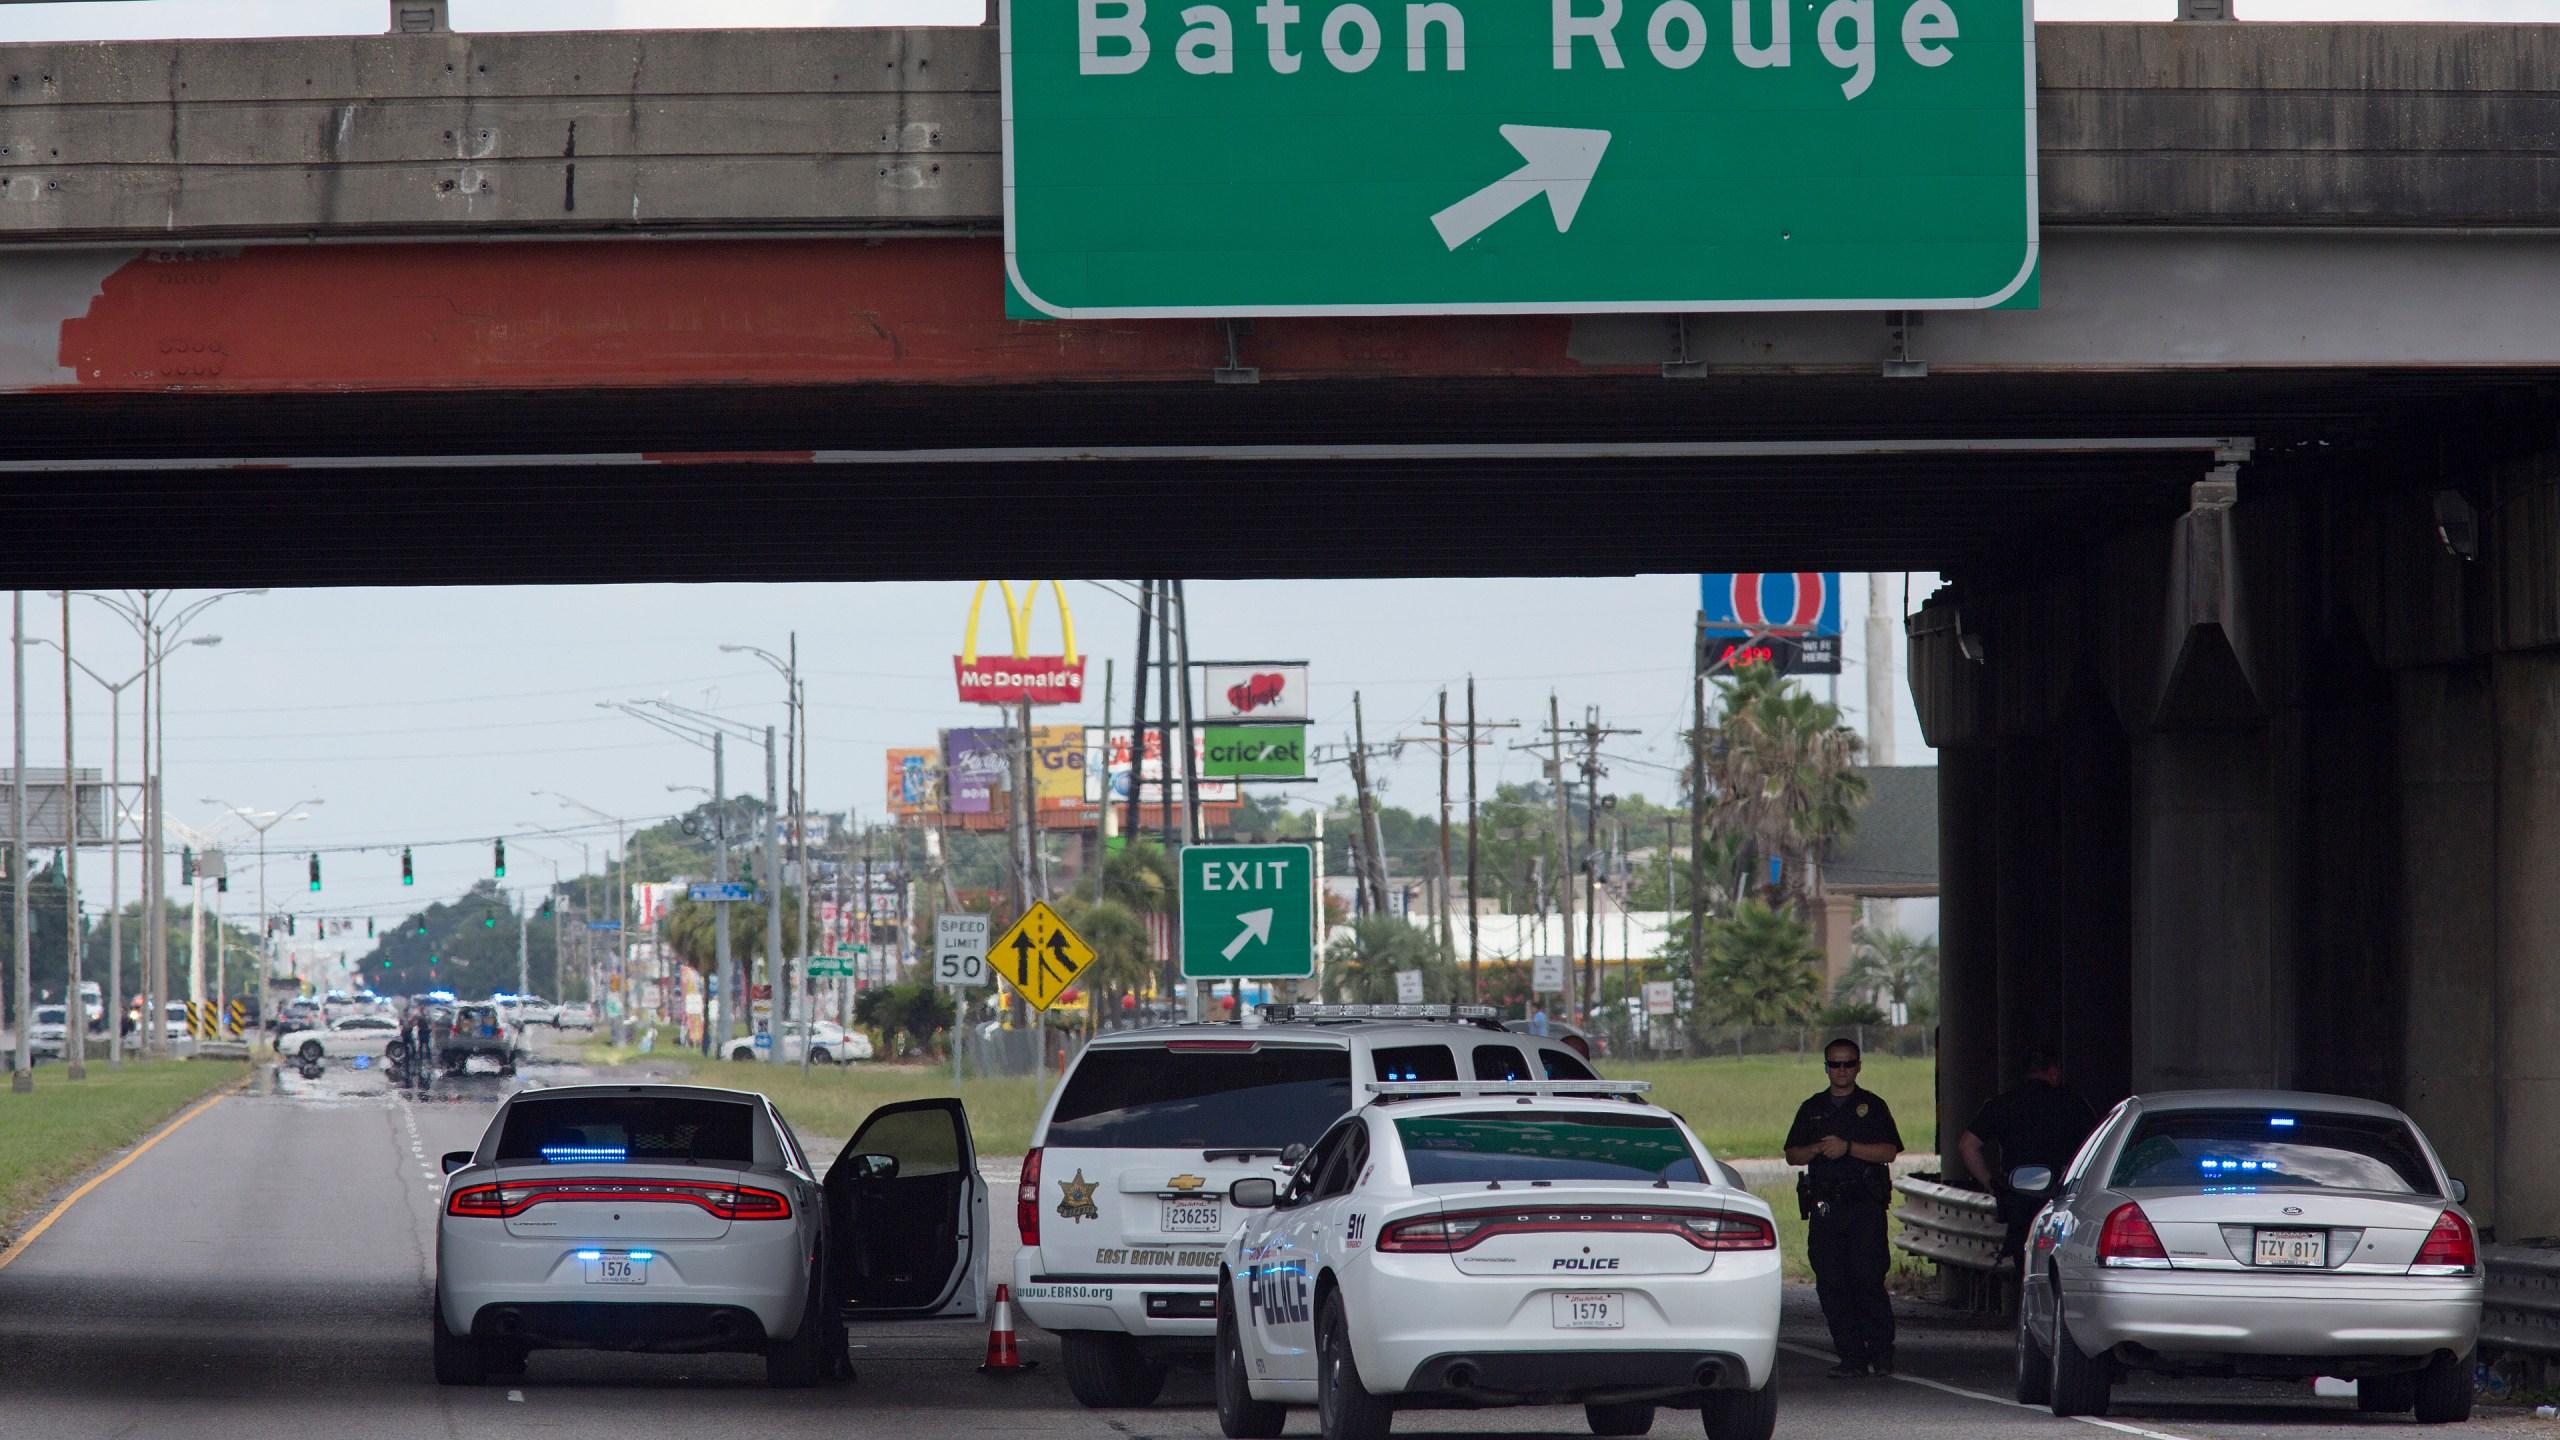 Police Shot Baton Rouge_182278